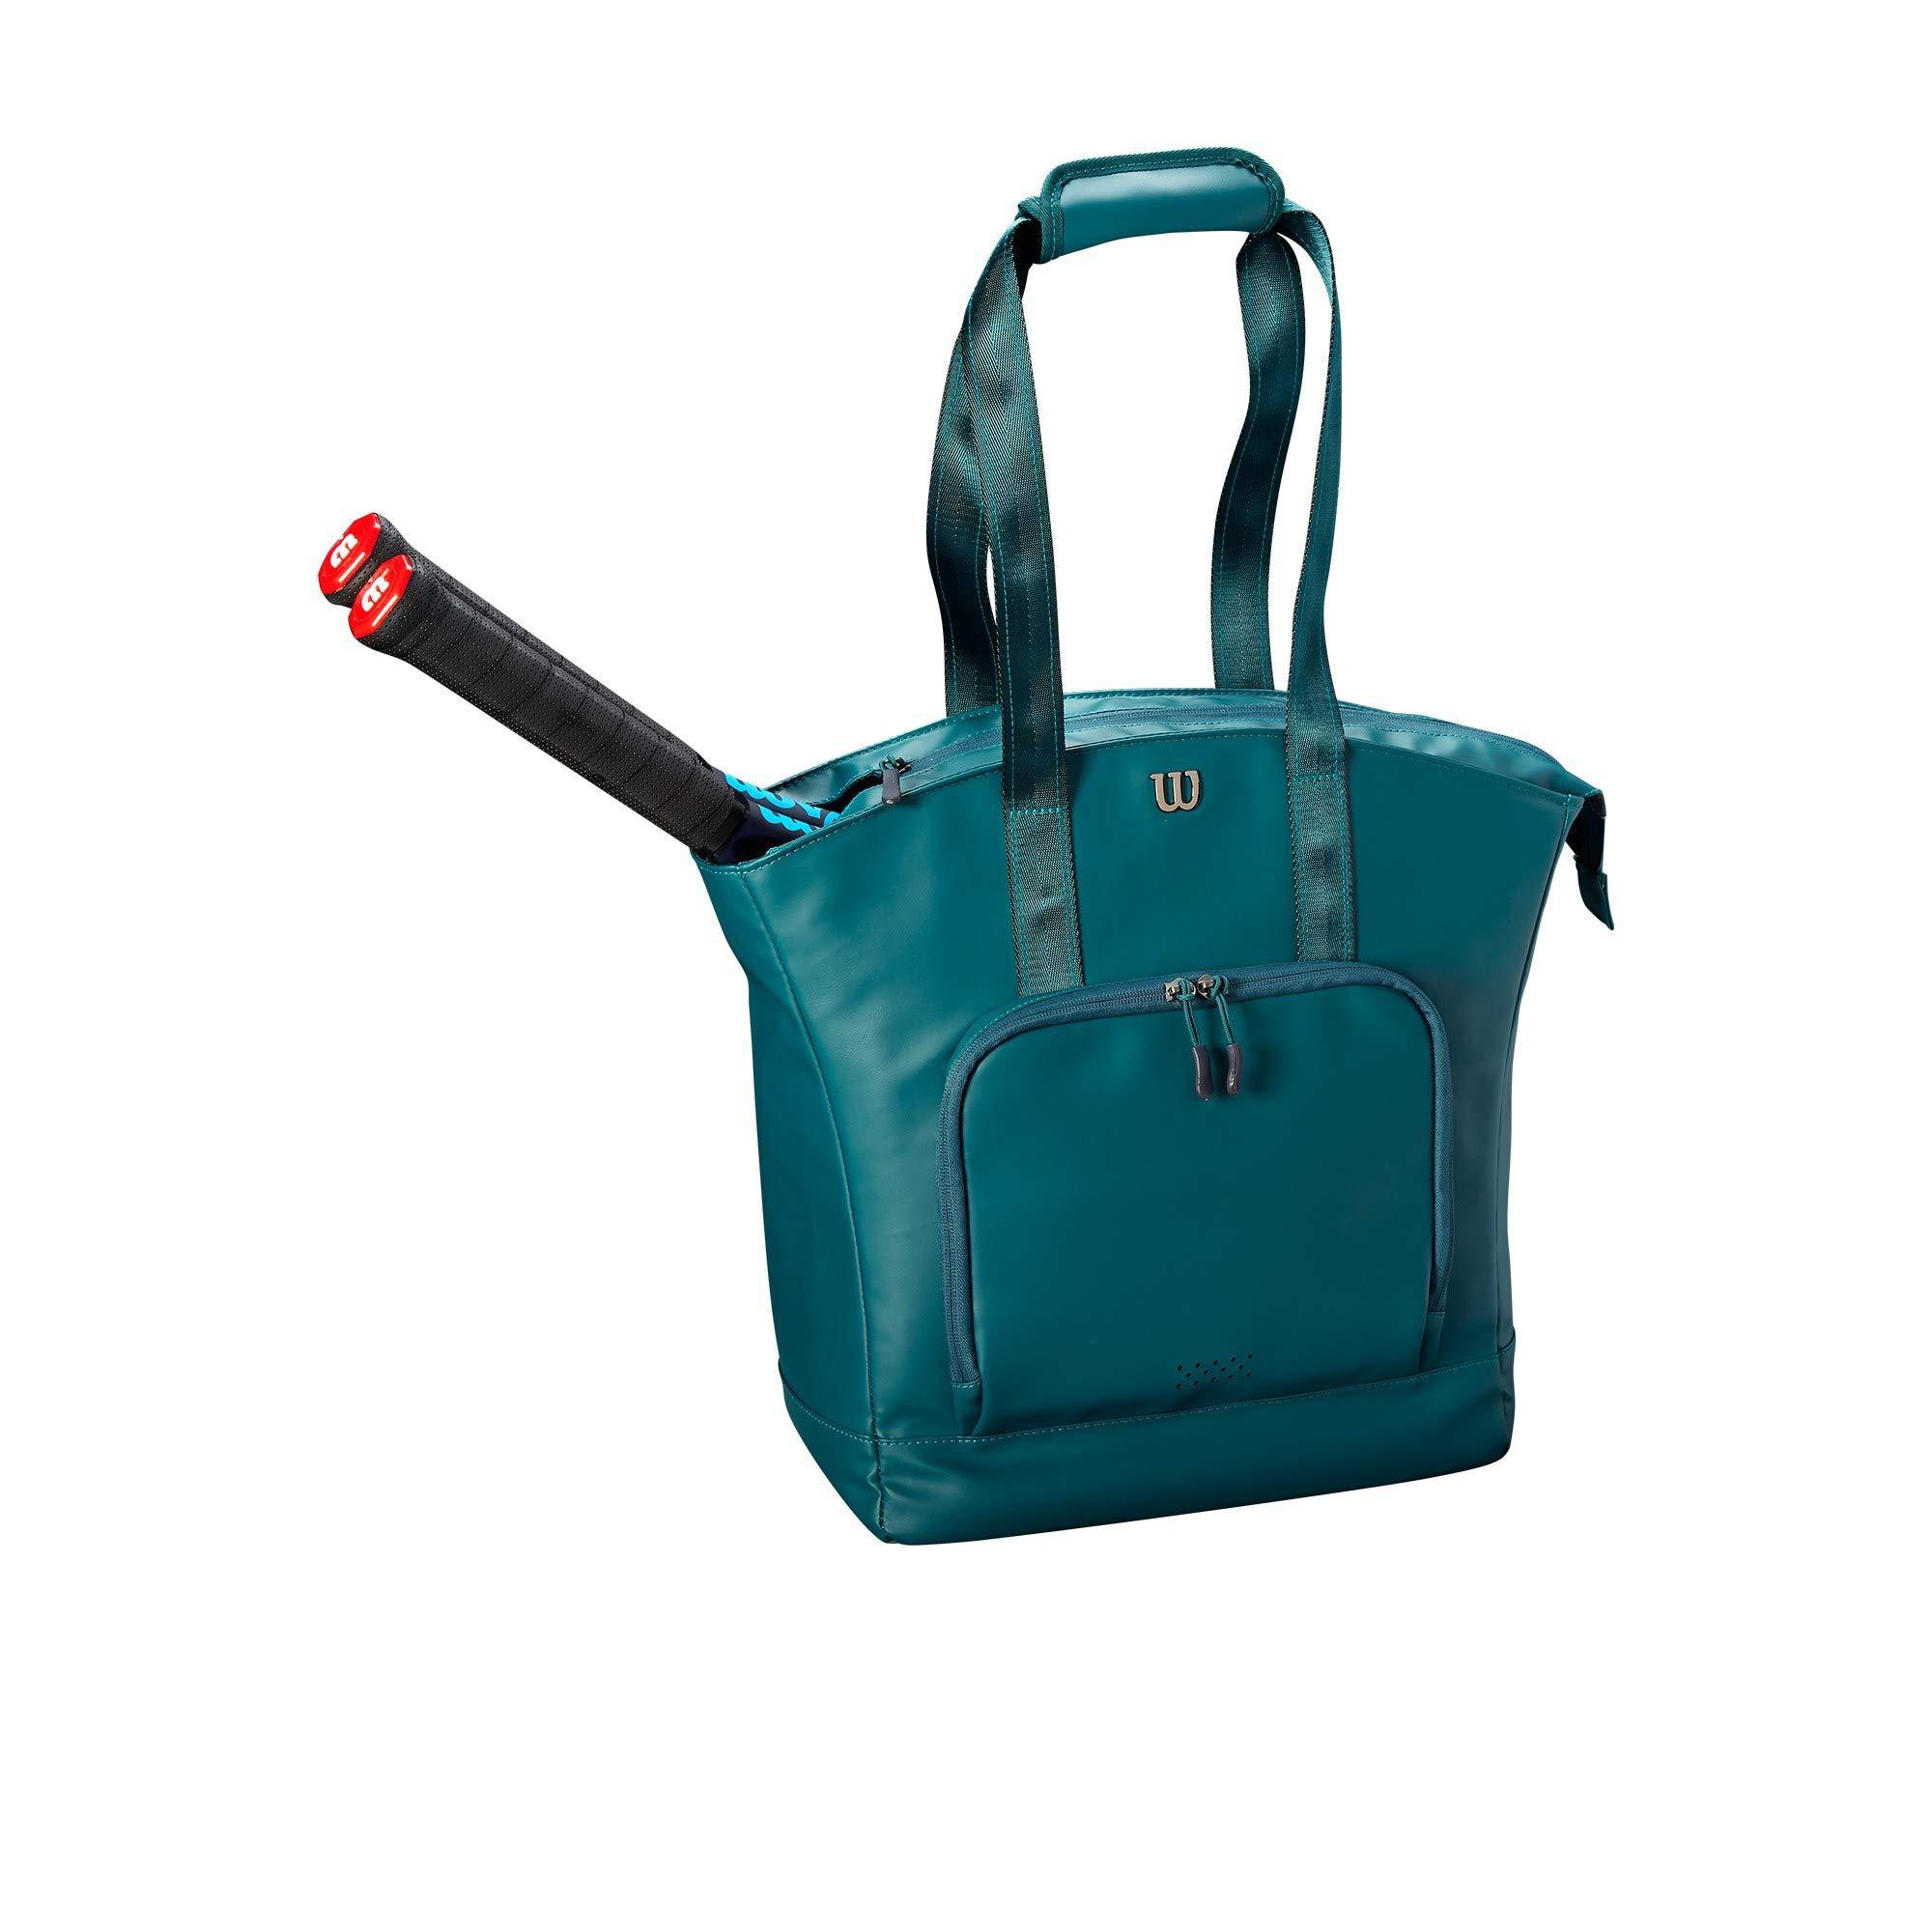 Wilson Women's Tote Bag, Green